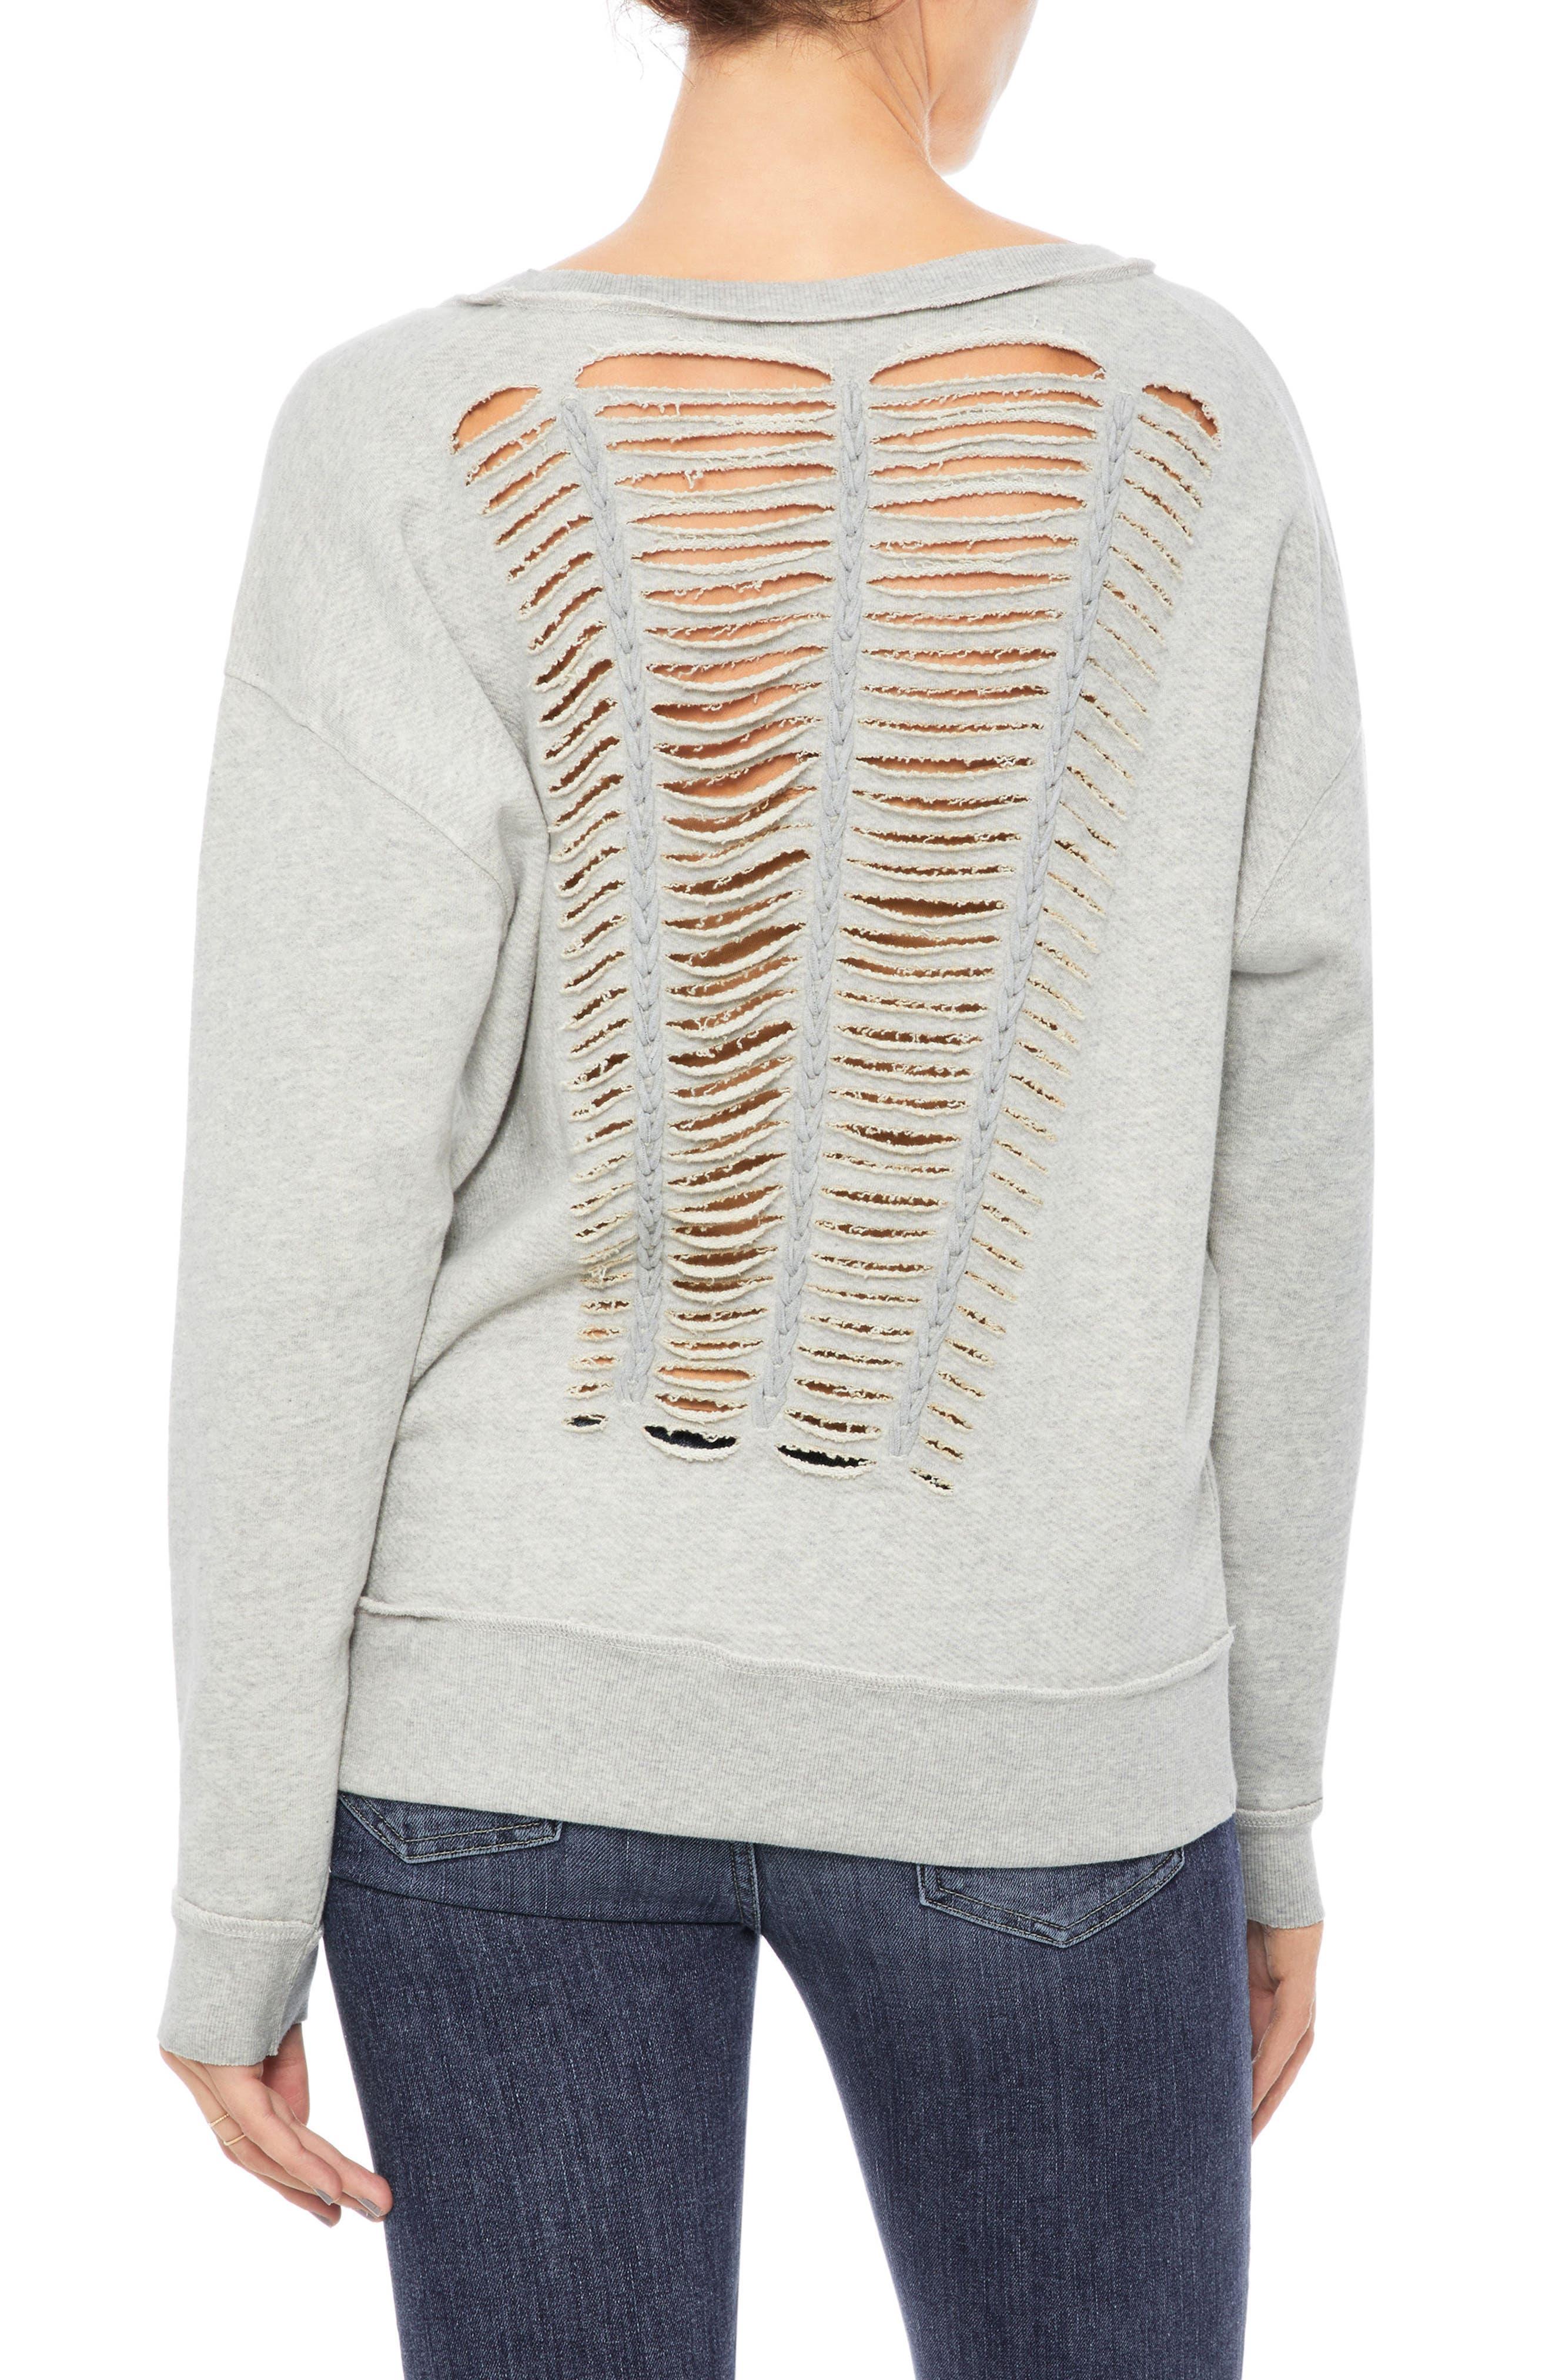 Piya Sweatshirt,                         Main,                         color, Heather Grey